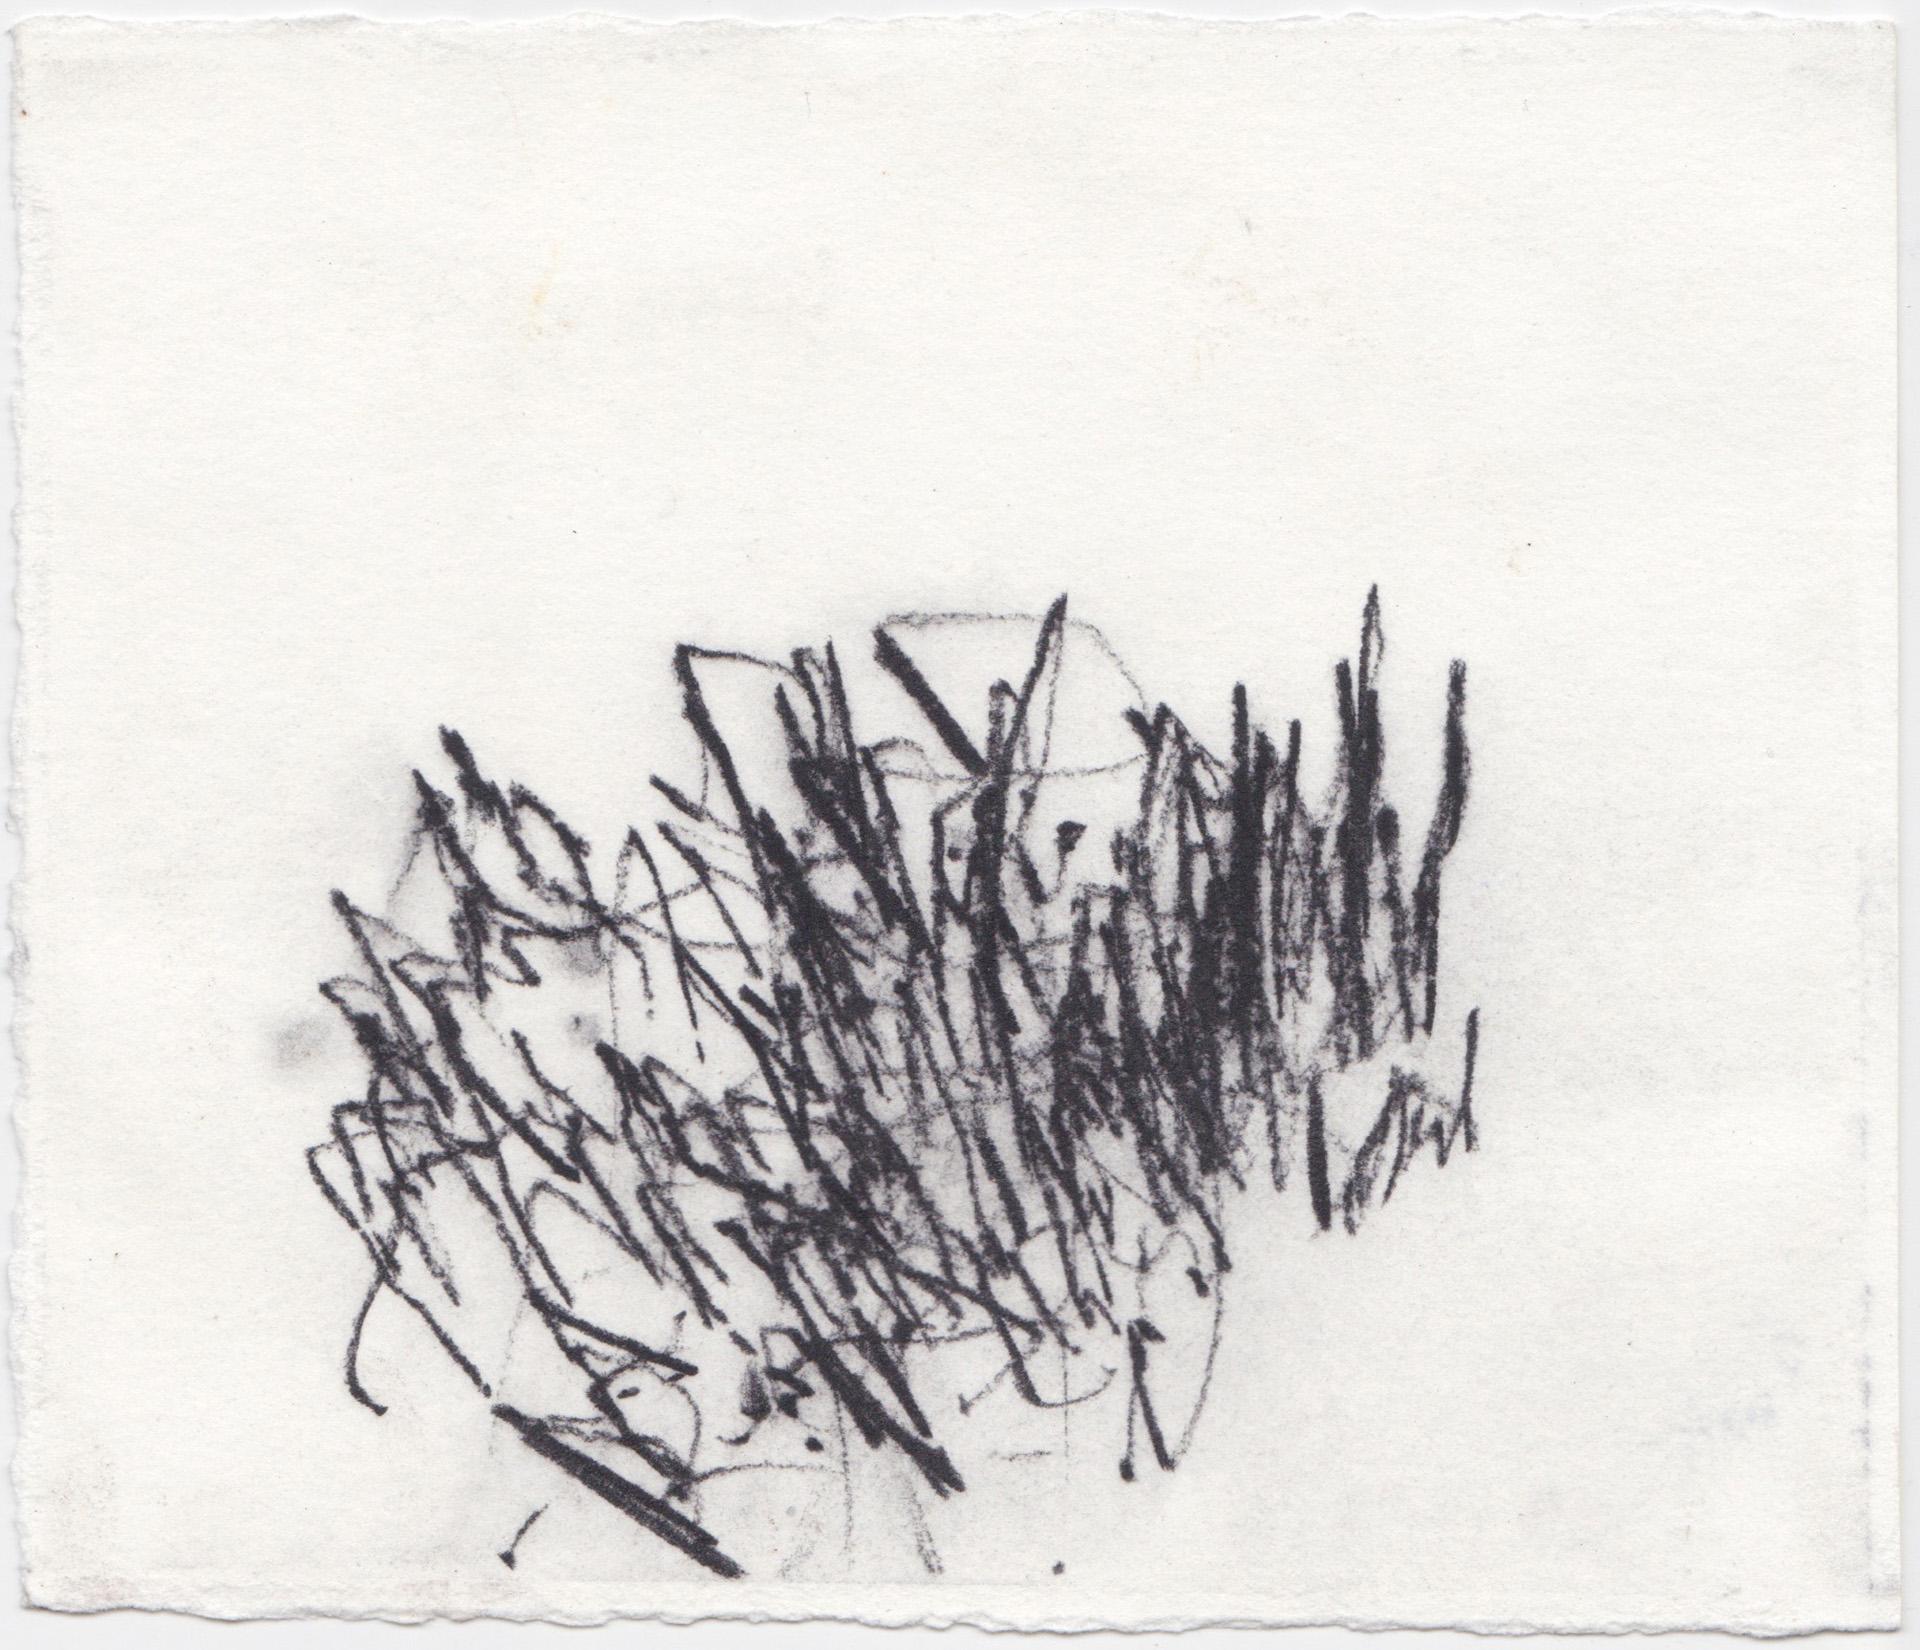 Ocean Drawing 001